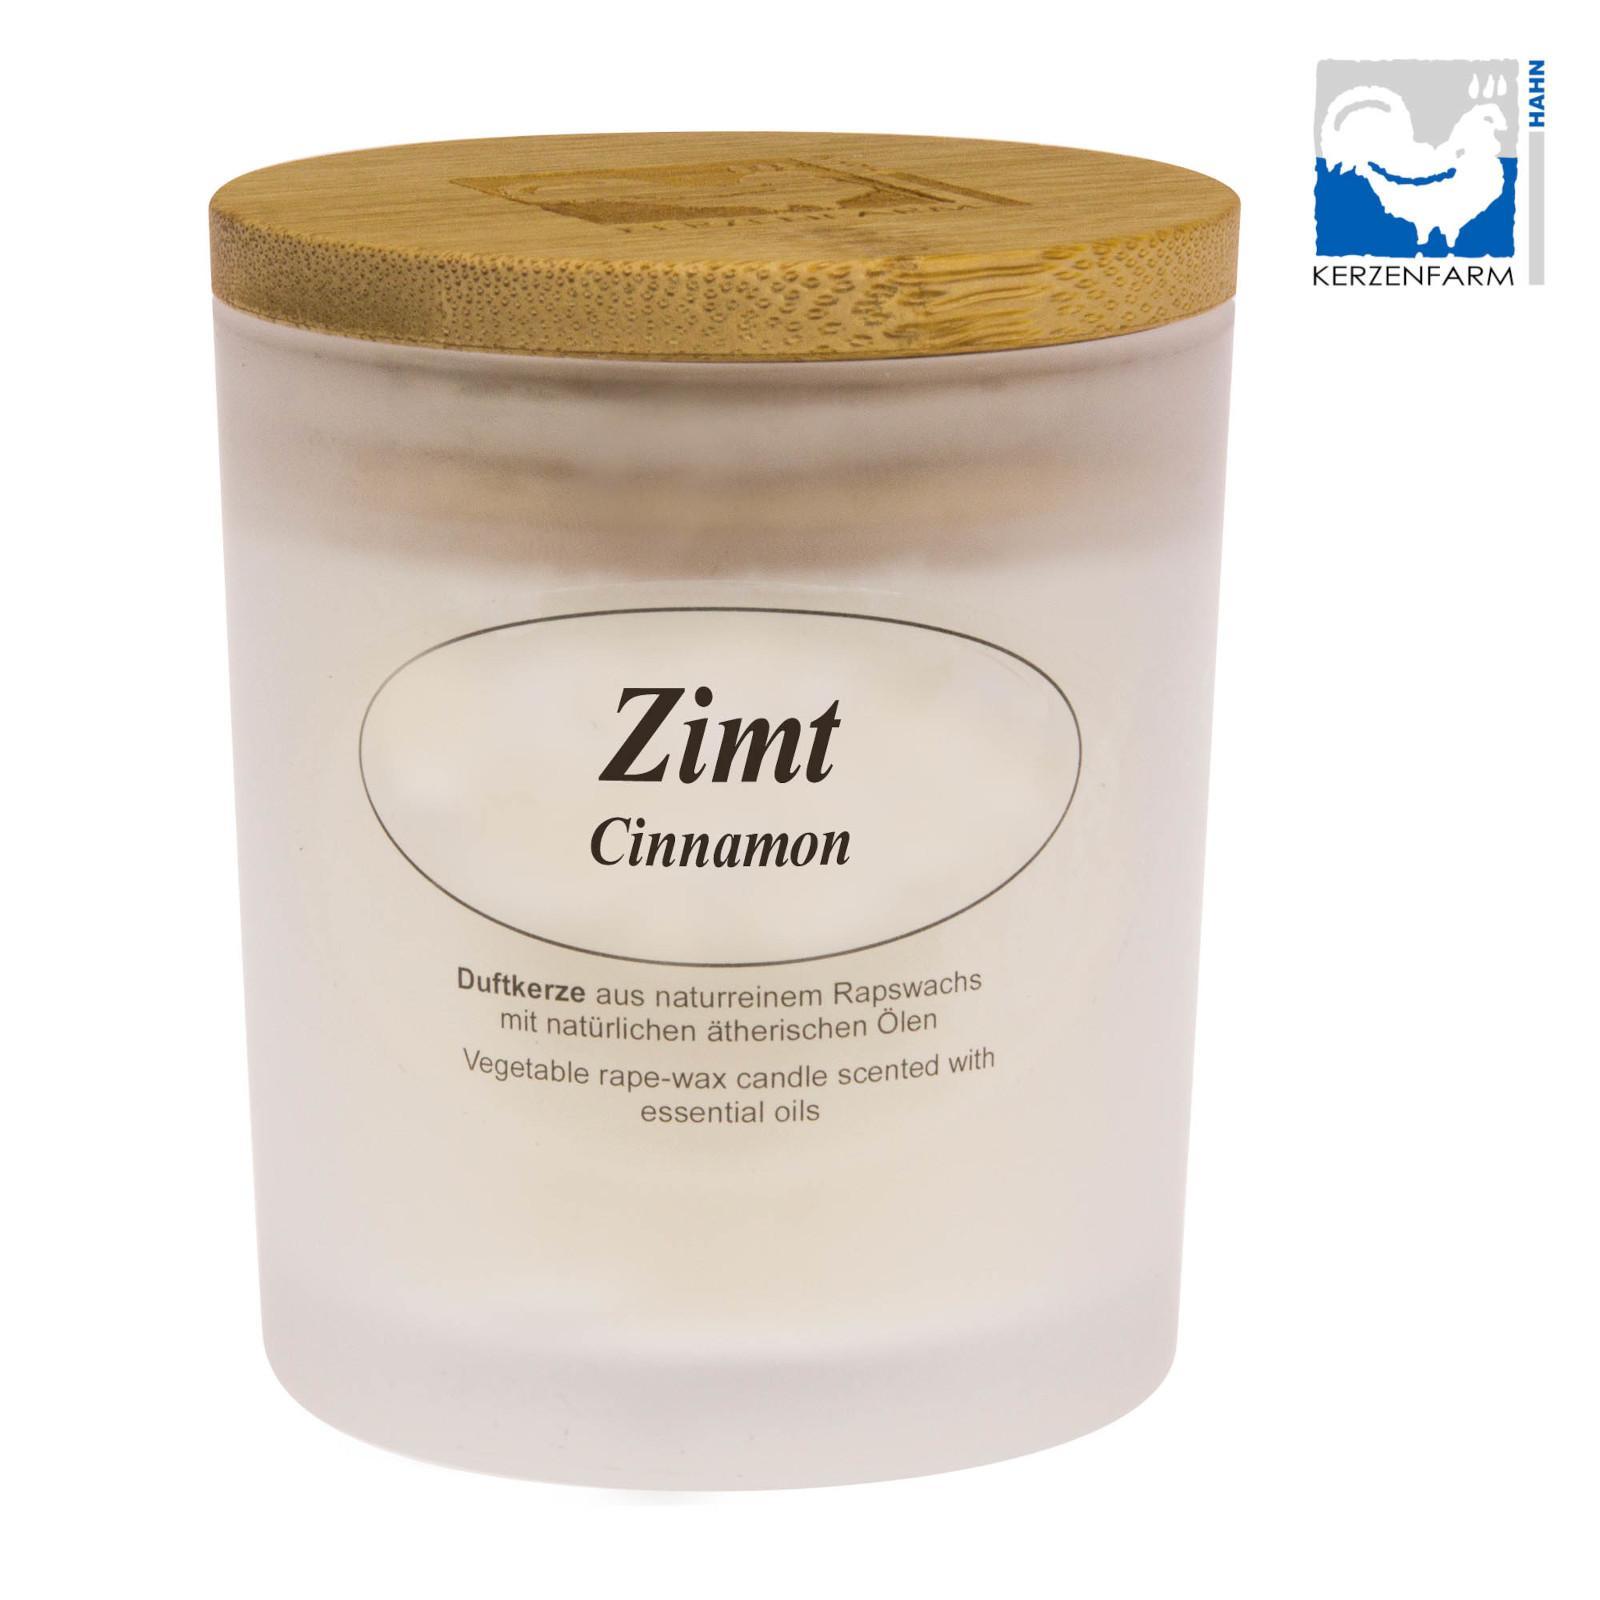 Kerzenfarm Přírodní svíčka Cinnamon, mléčné sklo 1 ks, 8 cm